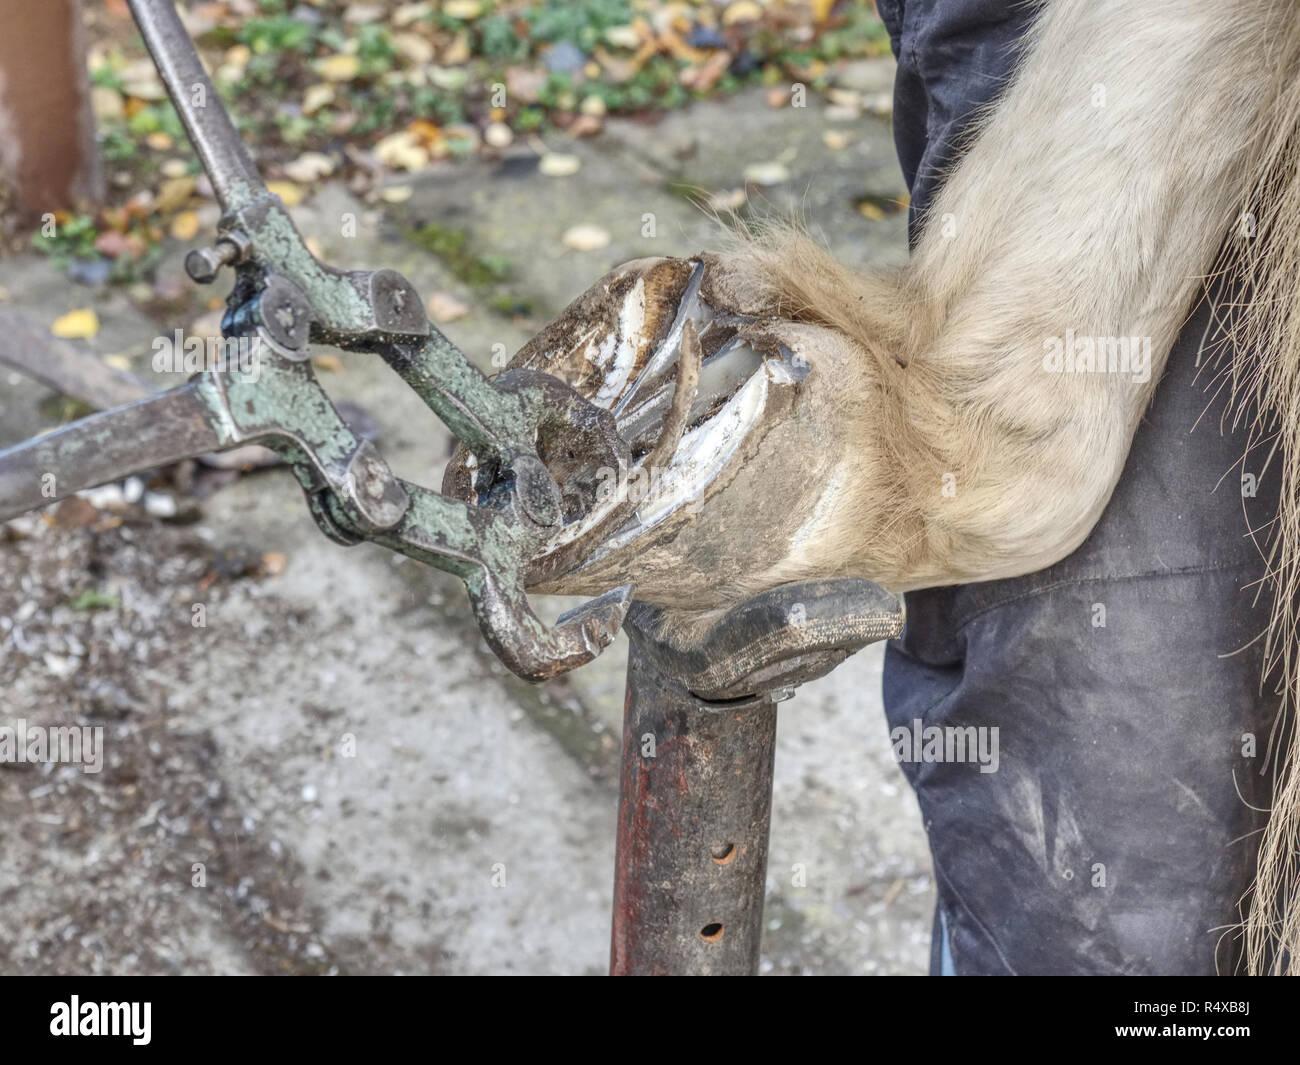 Necessary hoof care of horse before being mounted horseshoe. Cut of worn keratin. - Stock Image